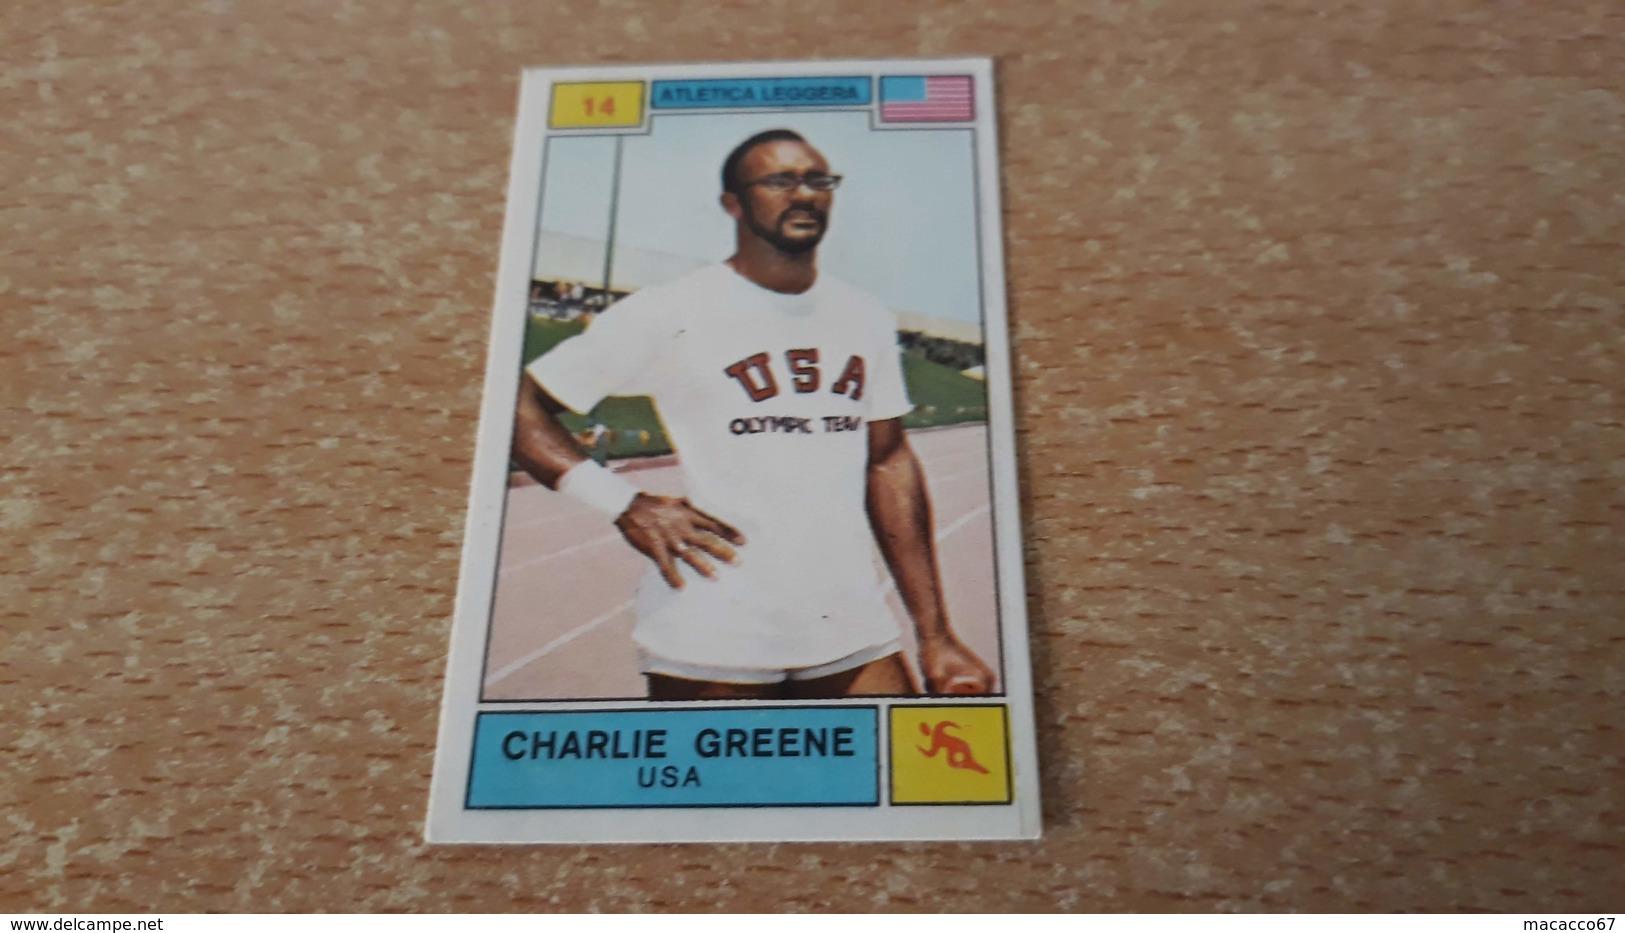 Figurina Panini Campioni Dello Sport 1969 - Charlie Greene - Panini